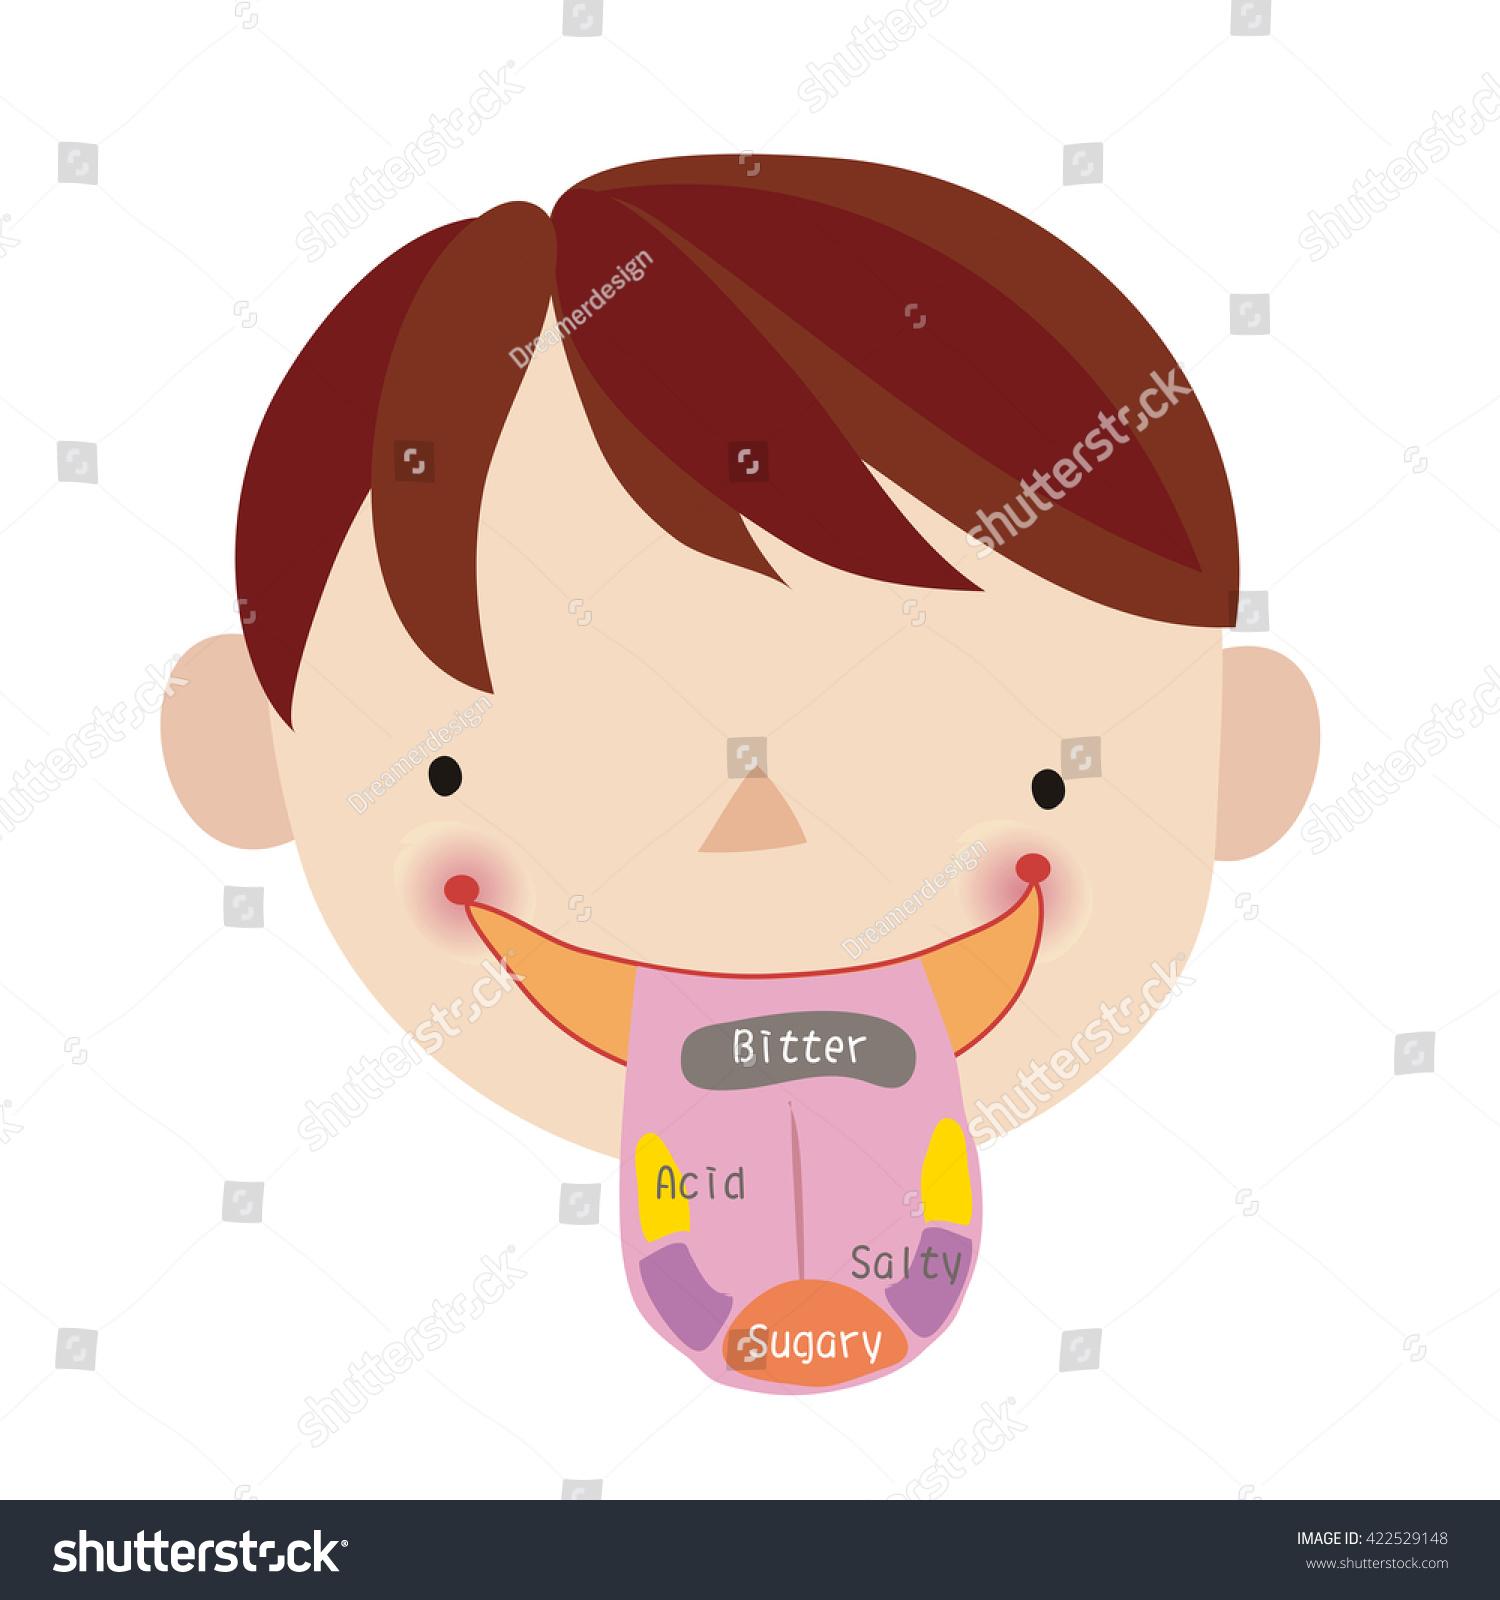 Anatomy Human Tongue Basic Tastes Stock Vector 422529148 - Shutterstock